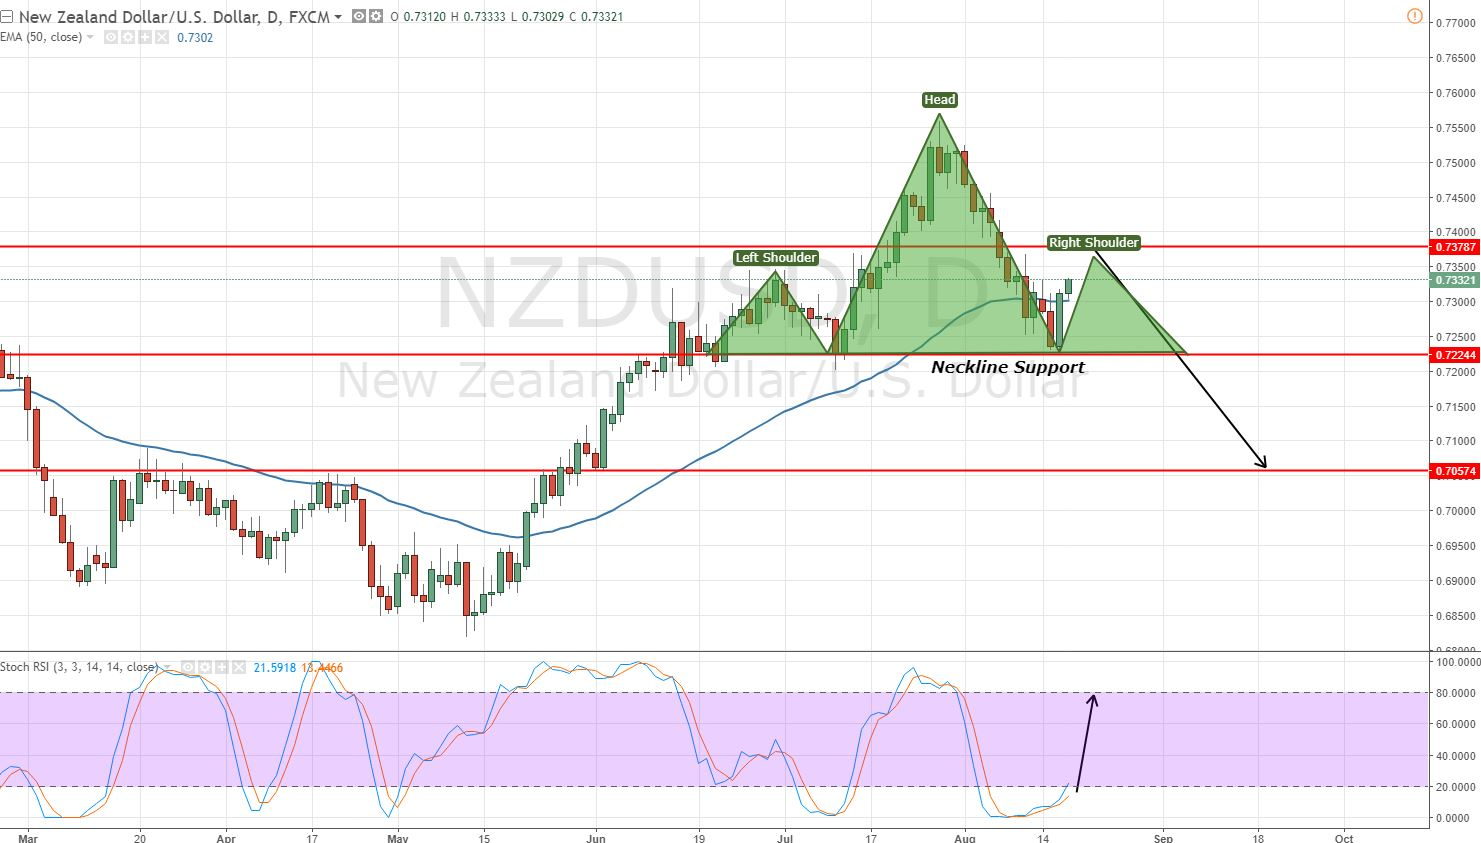 NZDUSD - Daily Chart - Head & Shoulder Pattern